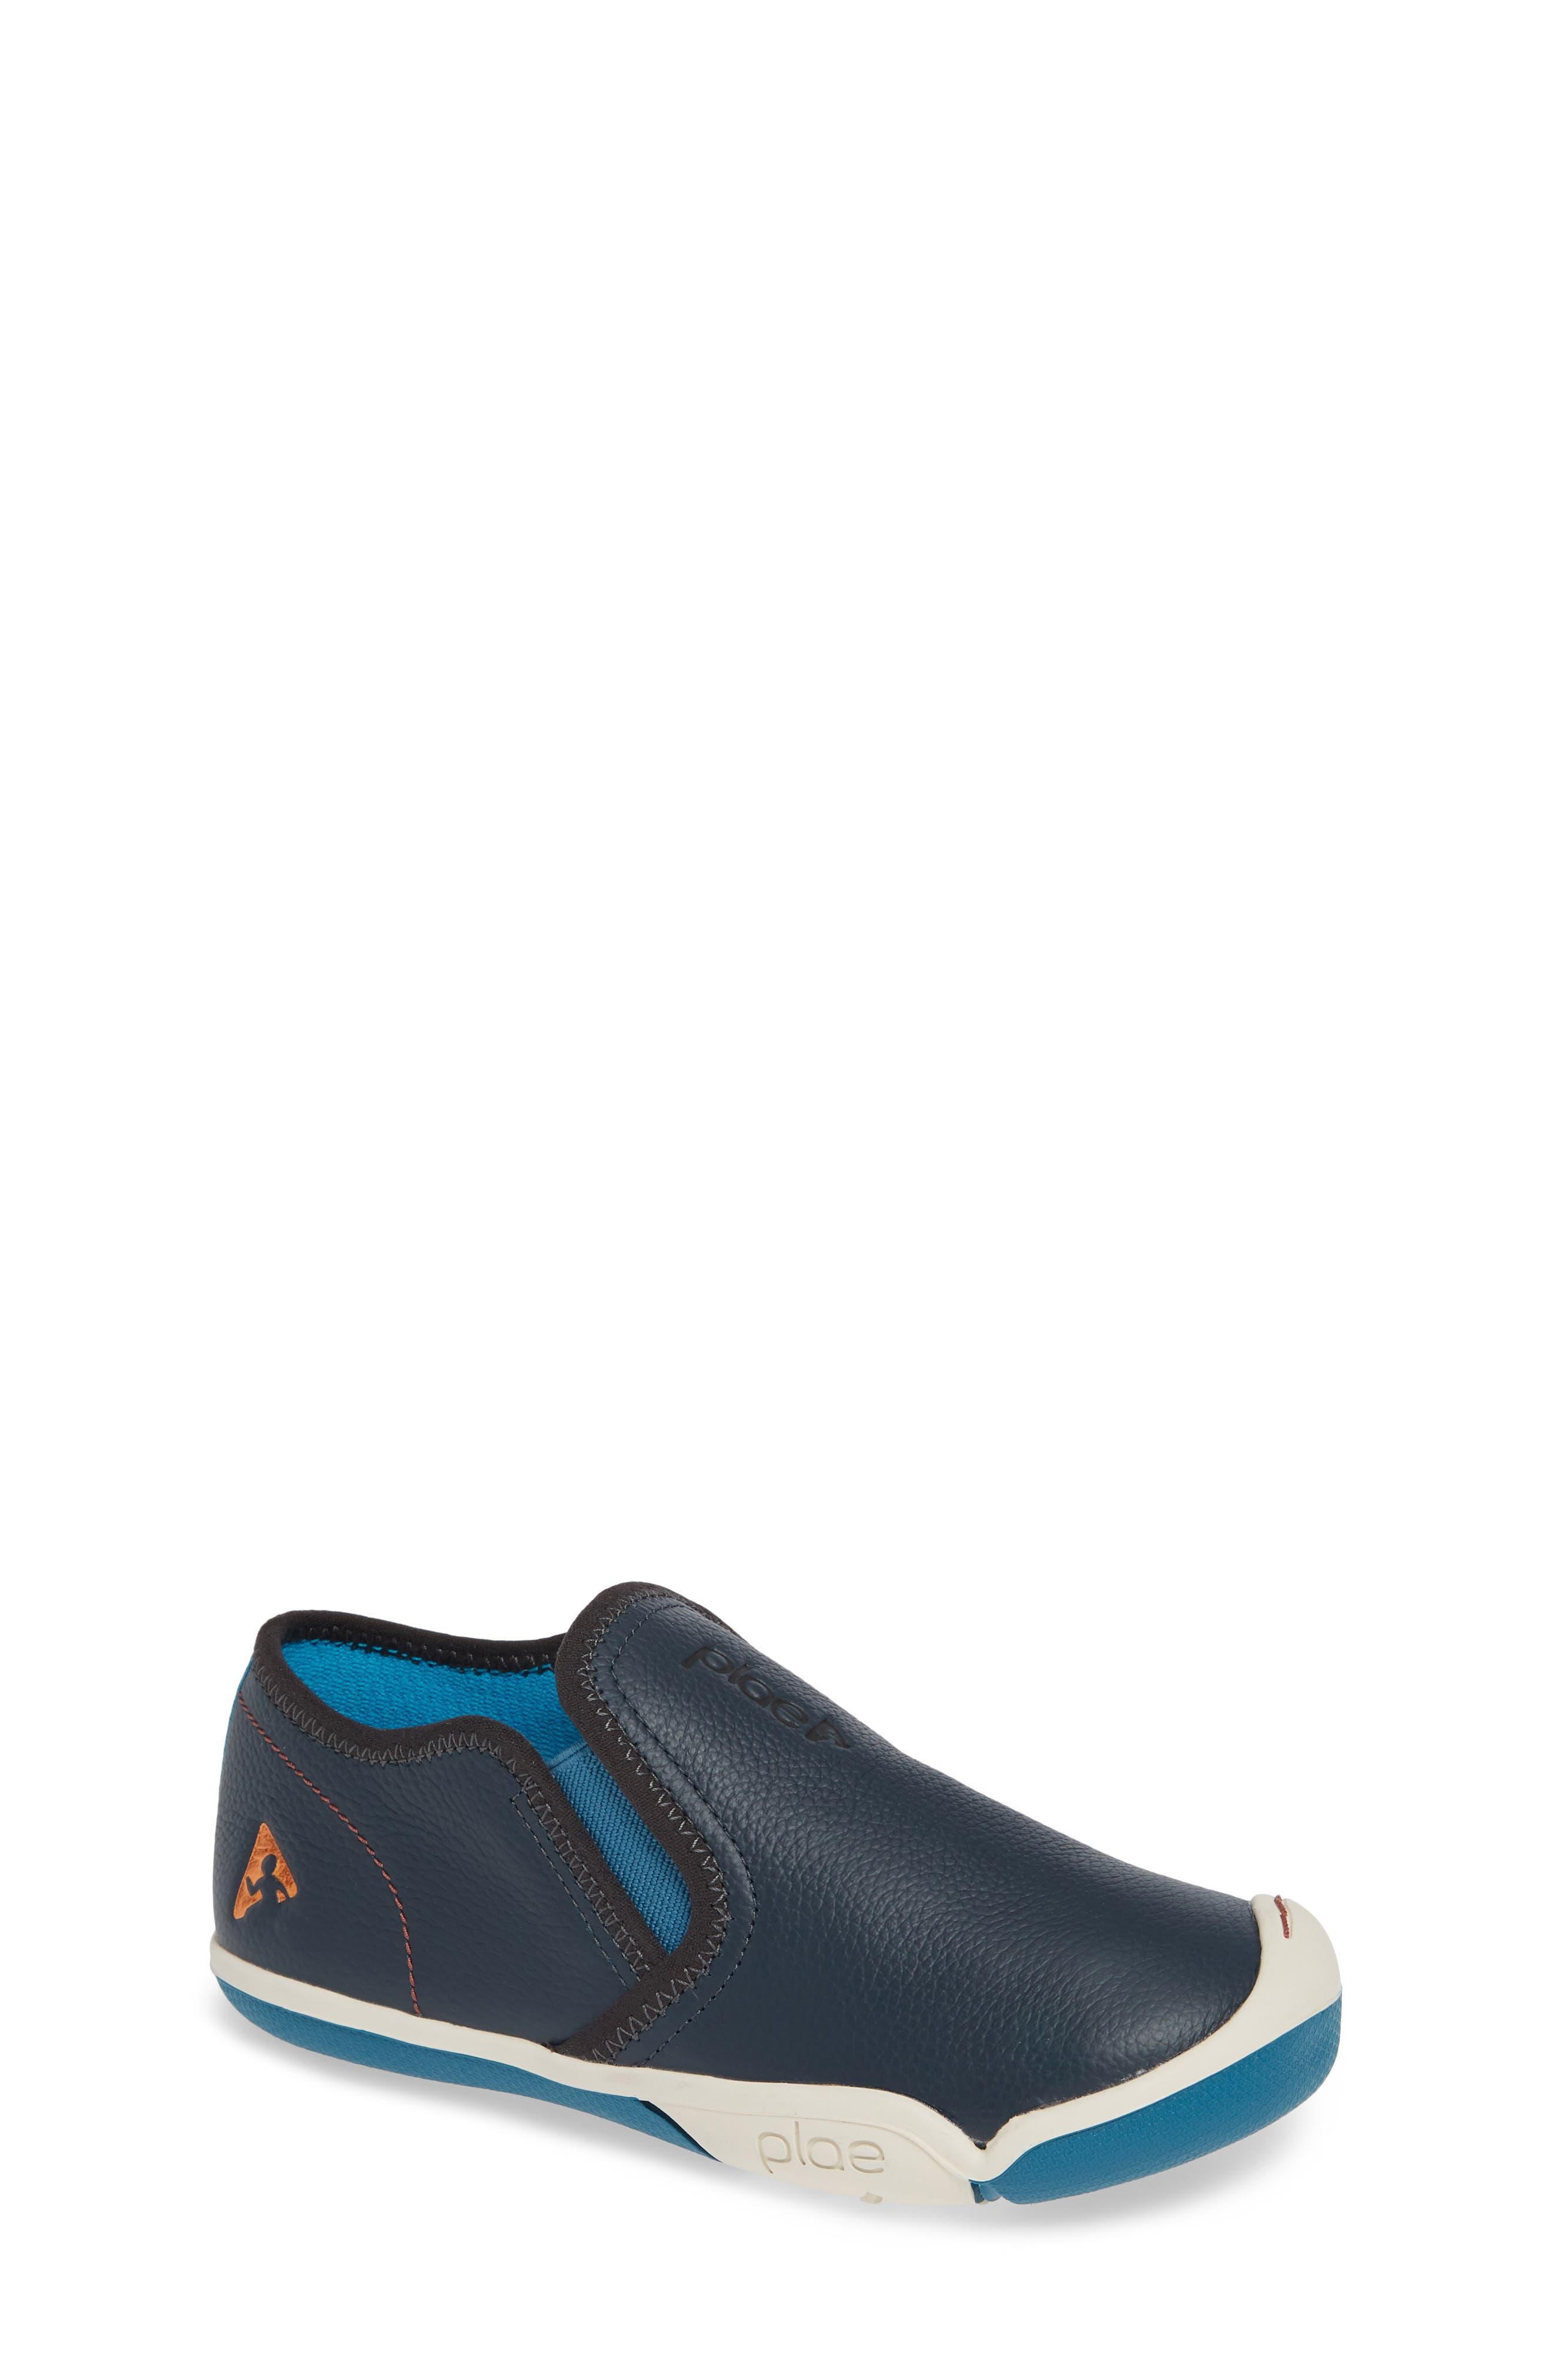 Migi Slip-On Sneaker,                         Main,                         color, Octo Ink